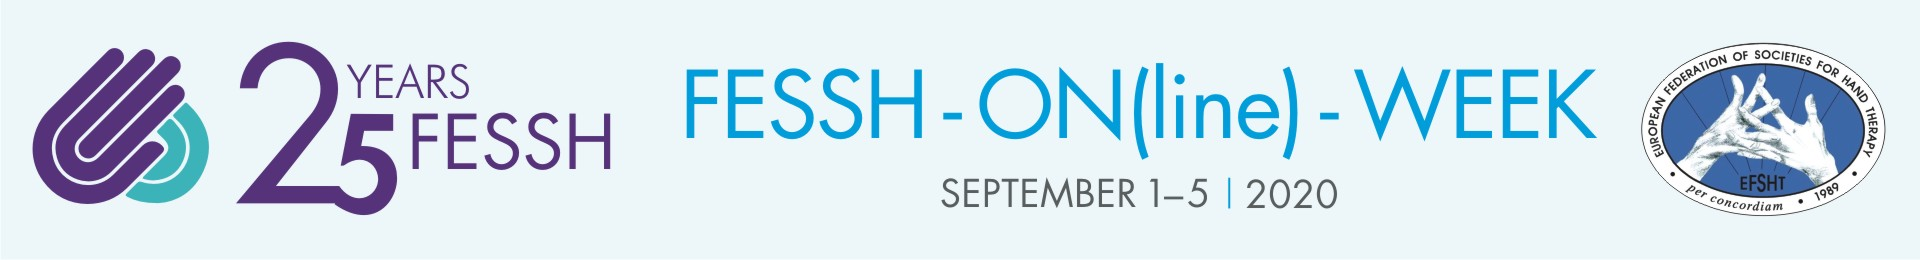 FESSH-ON(line)-WEEK banner